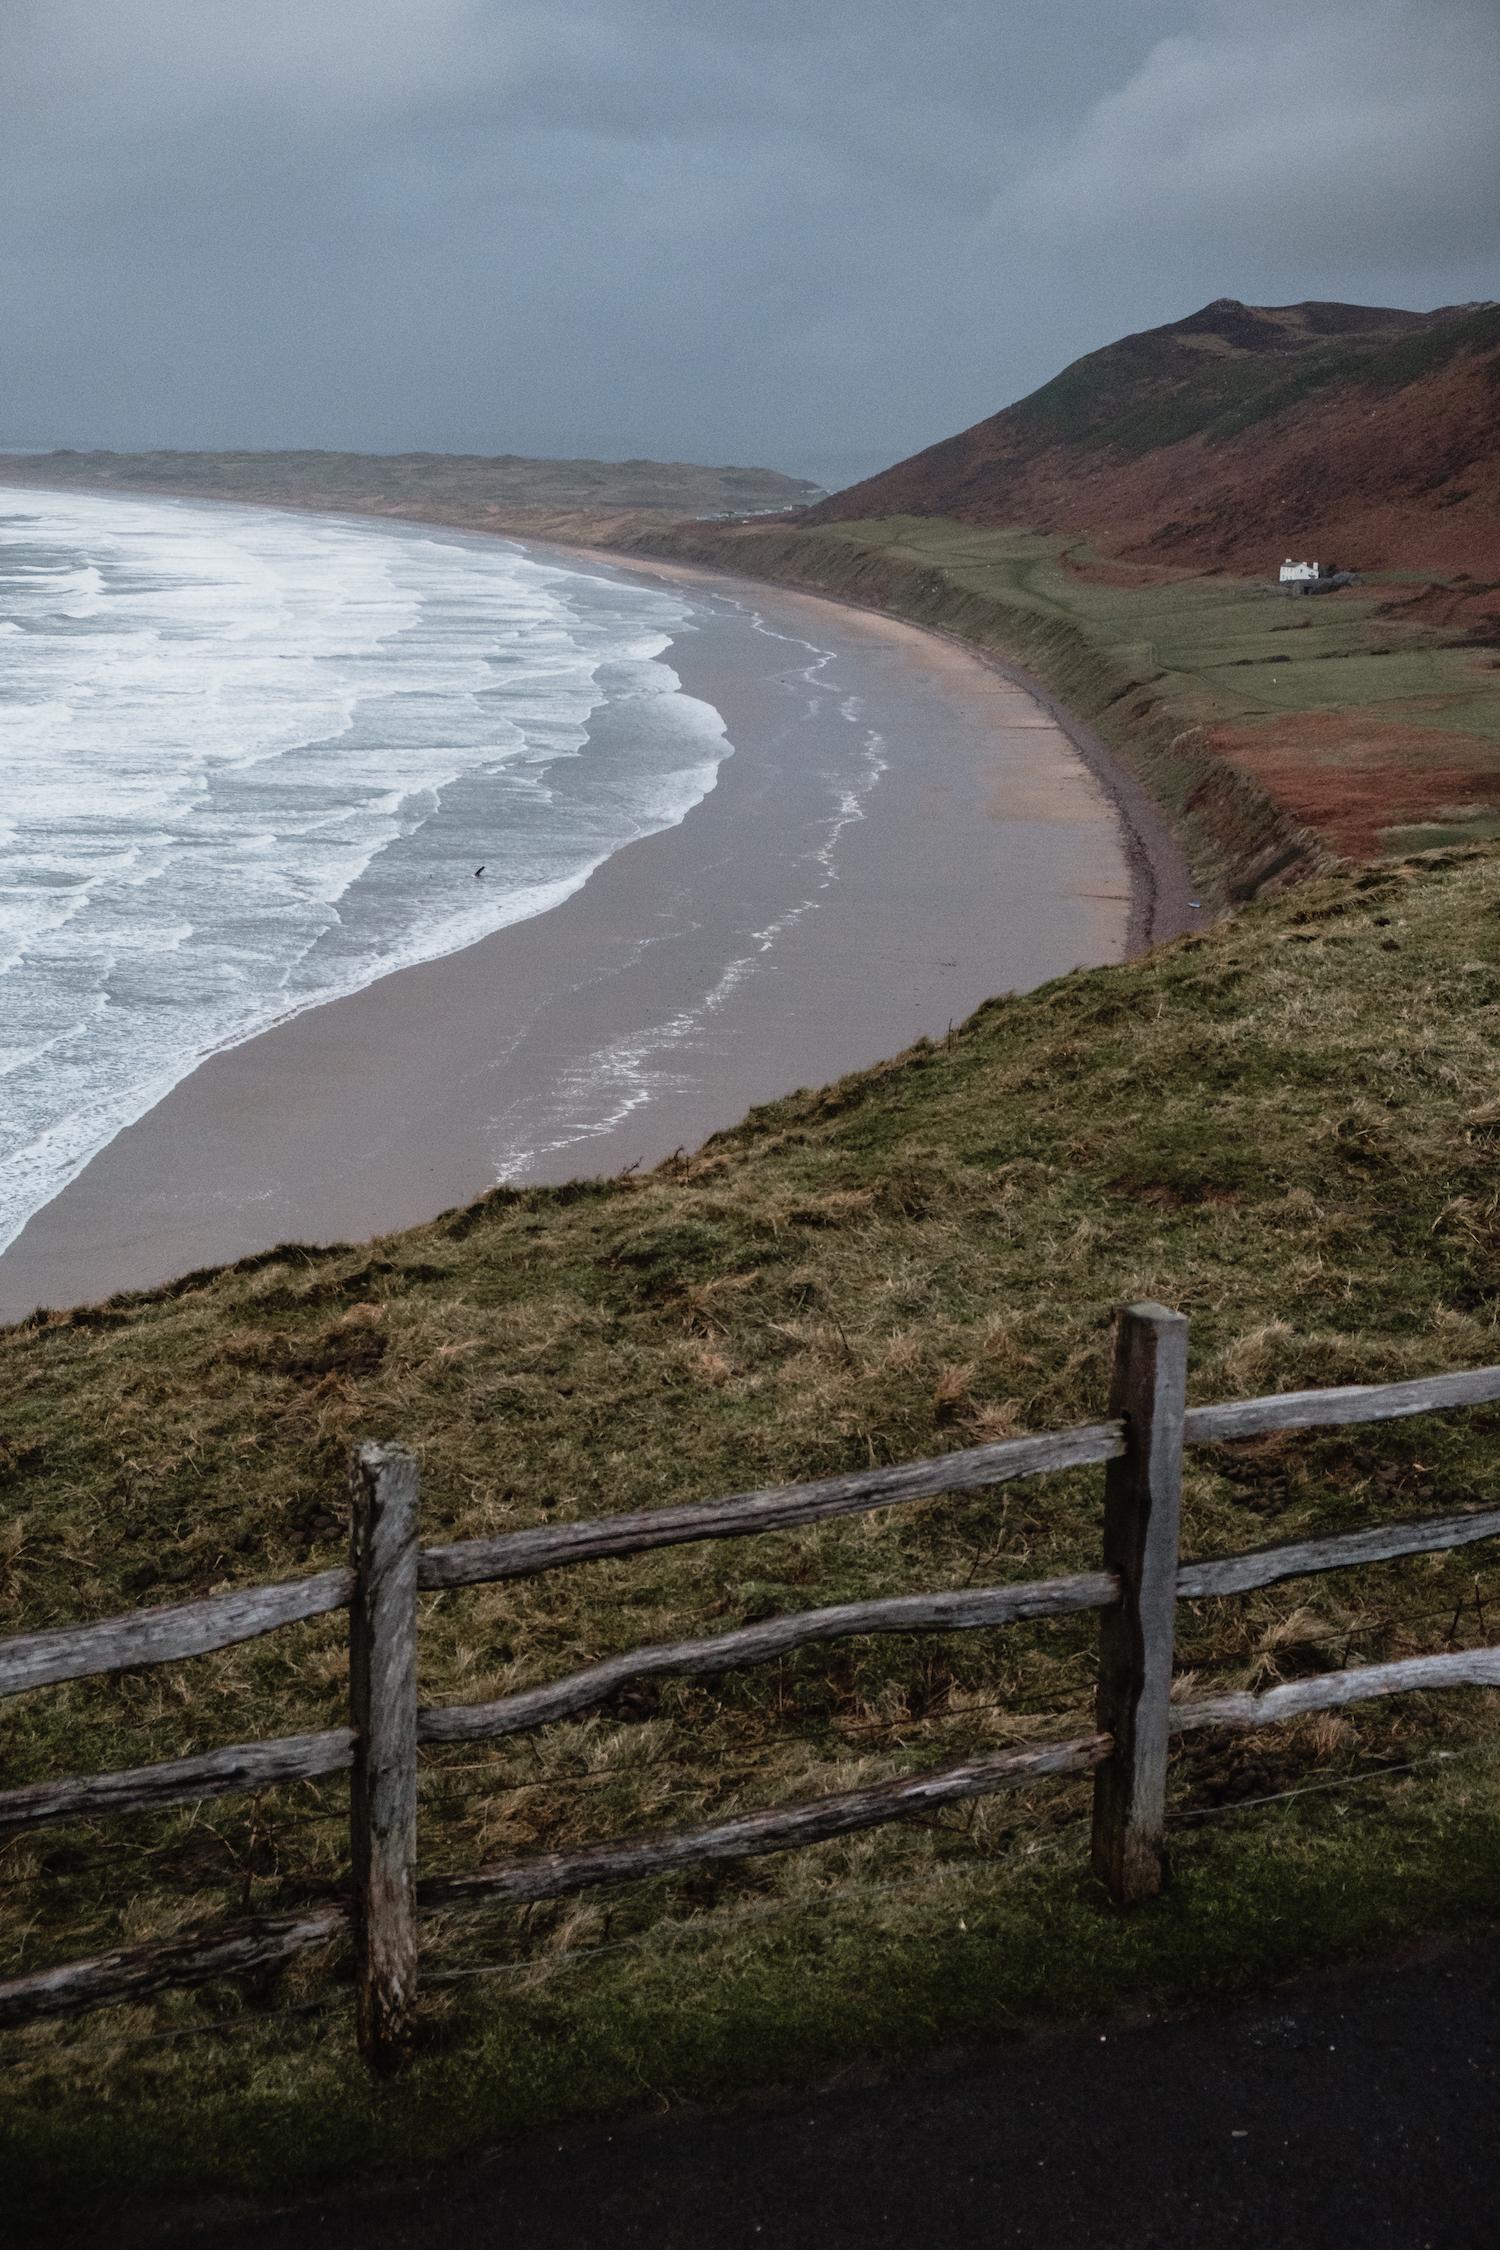 Rhossili Bay (Gower Peninsula, South Wales).